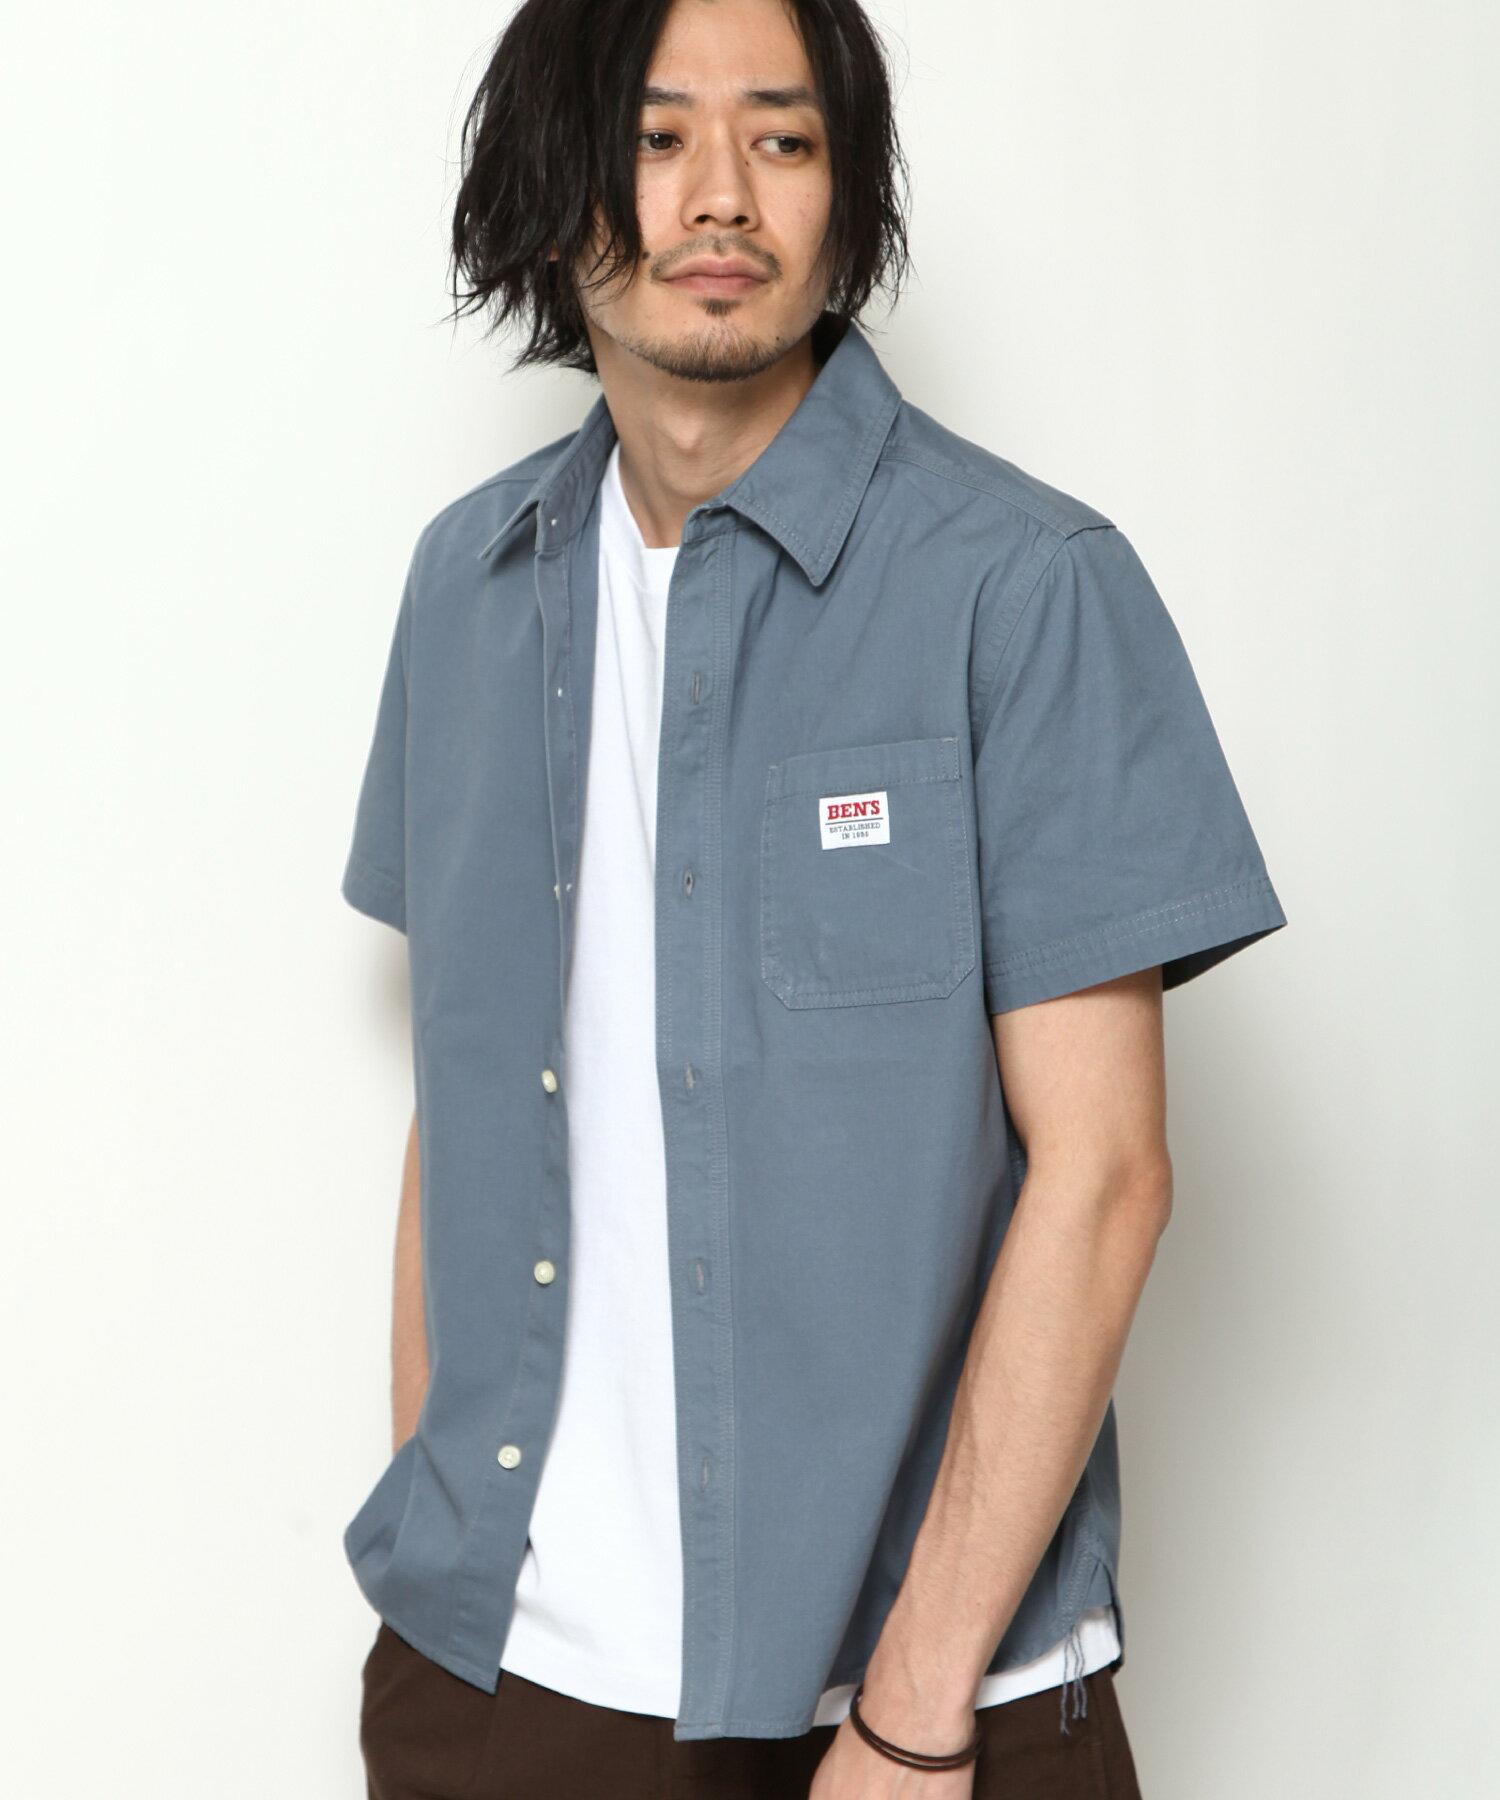 【BEN DAVIS】LOGO名牌刺繡工裝襯衫 短袖 7